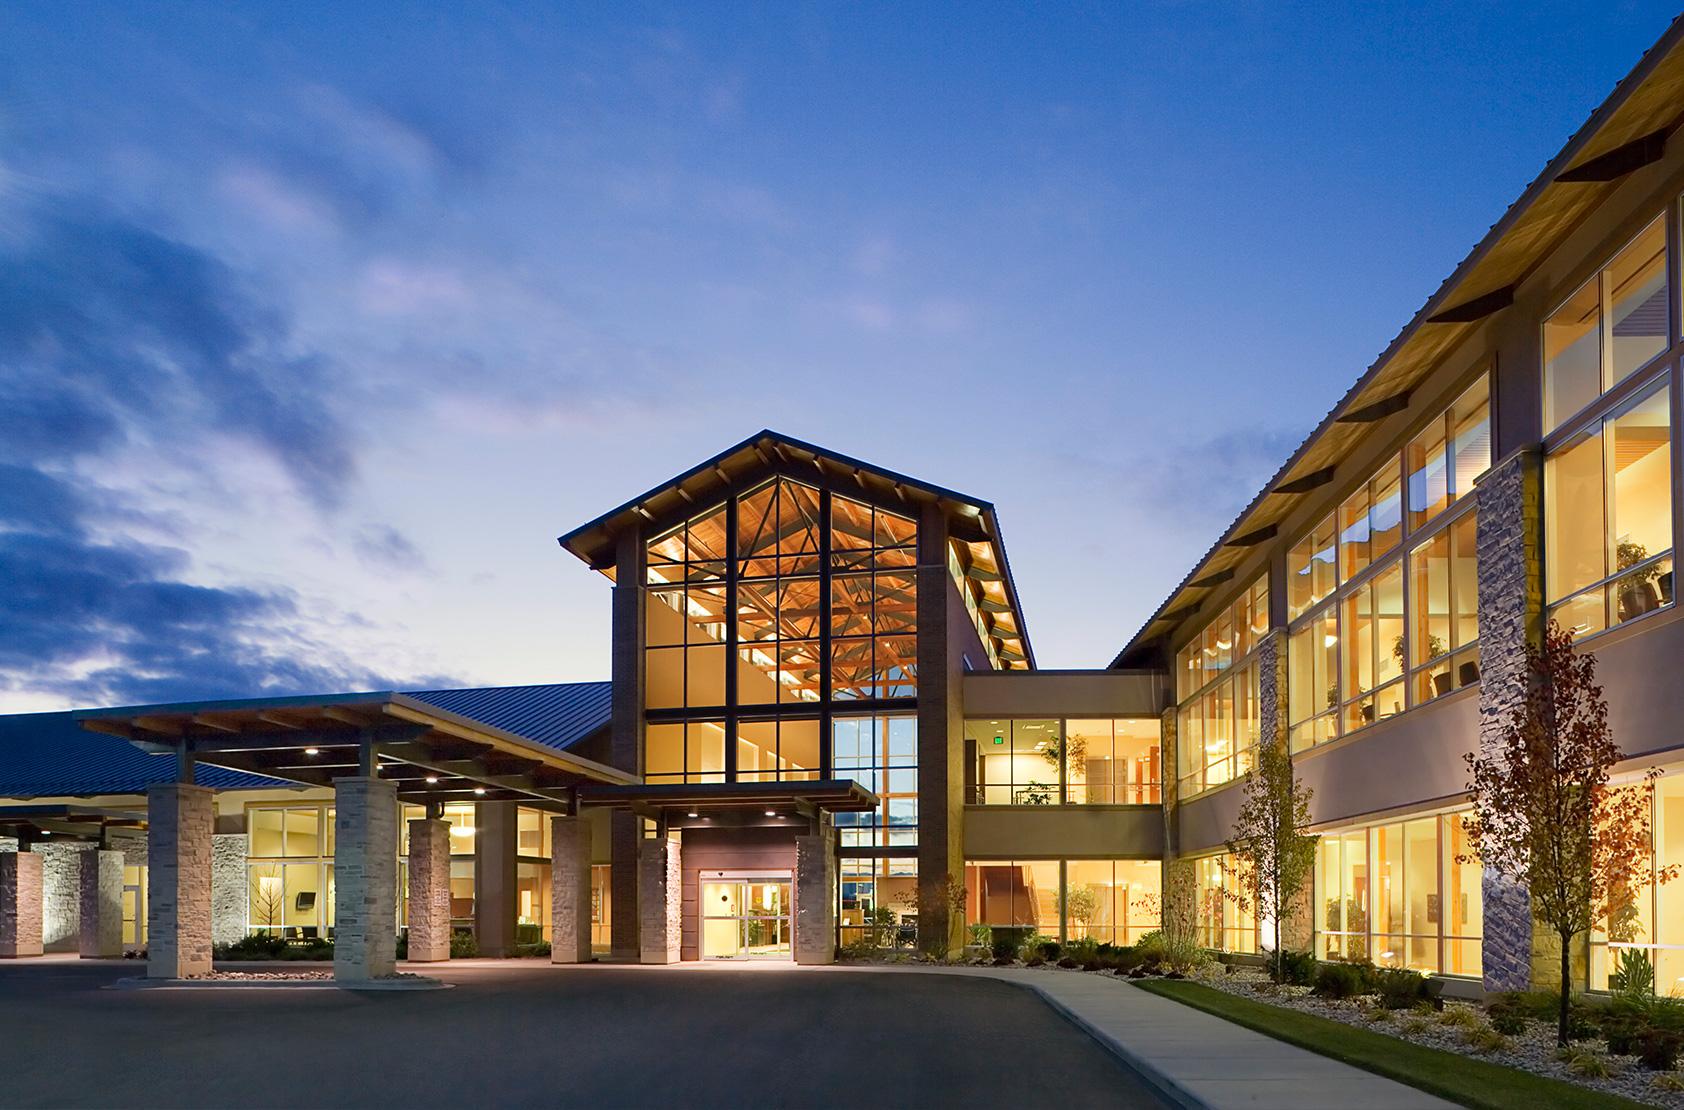 Orthopedic and Sports Institute - Ambulatory Surgery Center